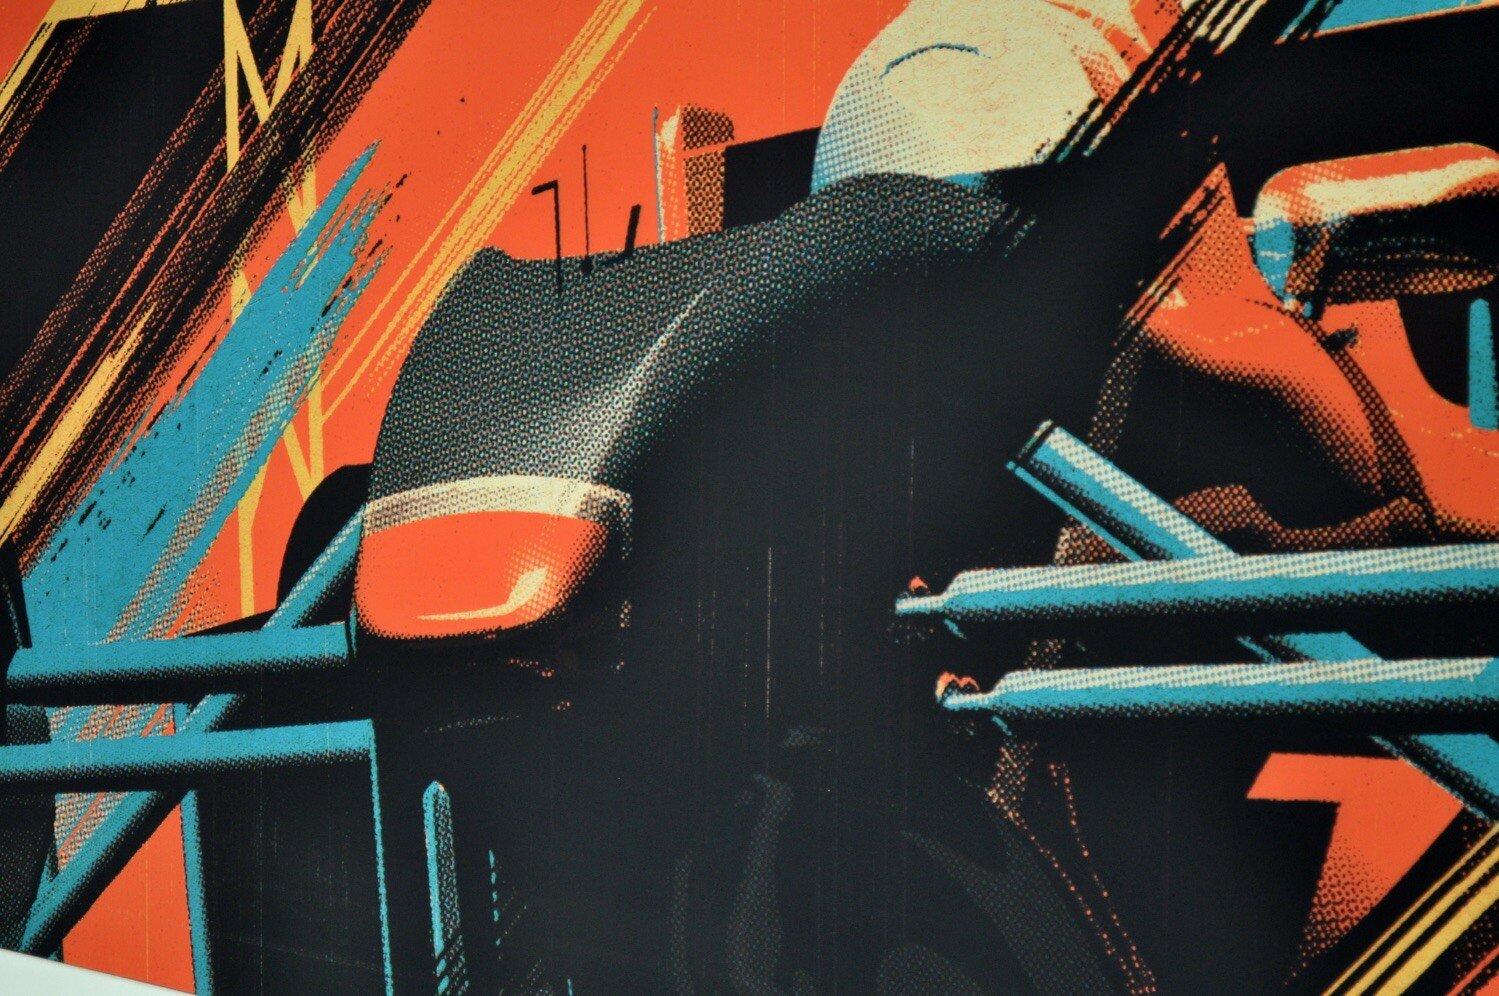 tavis-coburn-F1-team-graphic-illustration-marussia-27.jpg